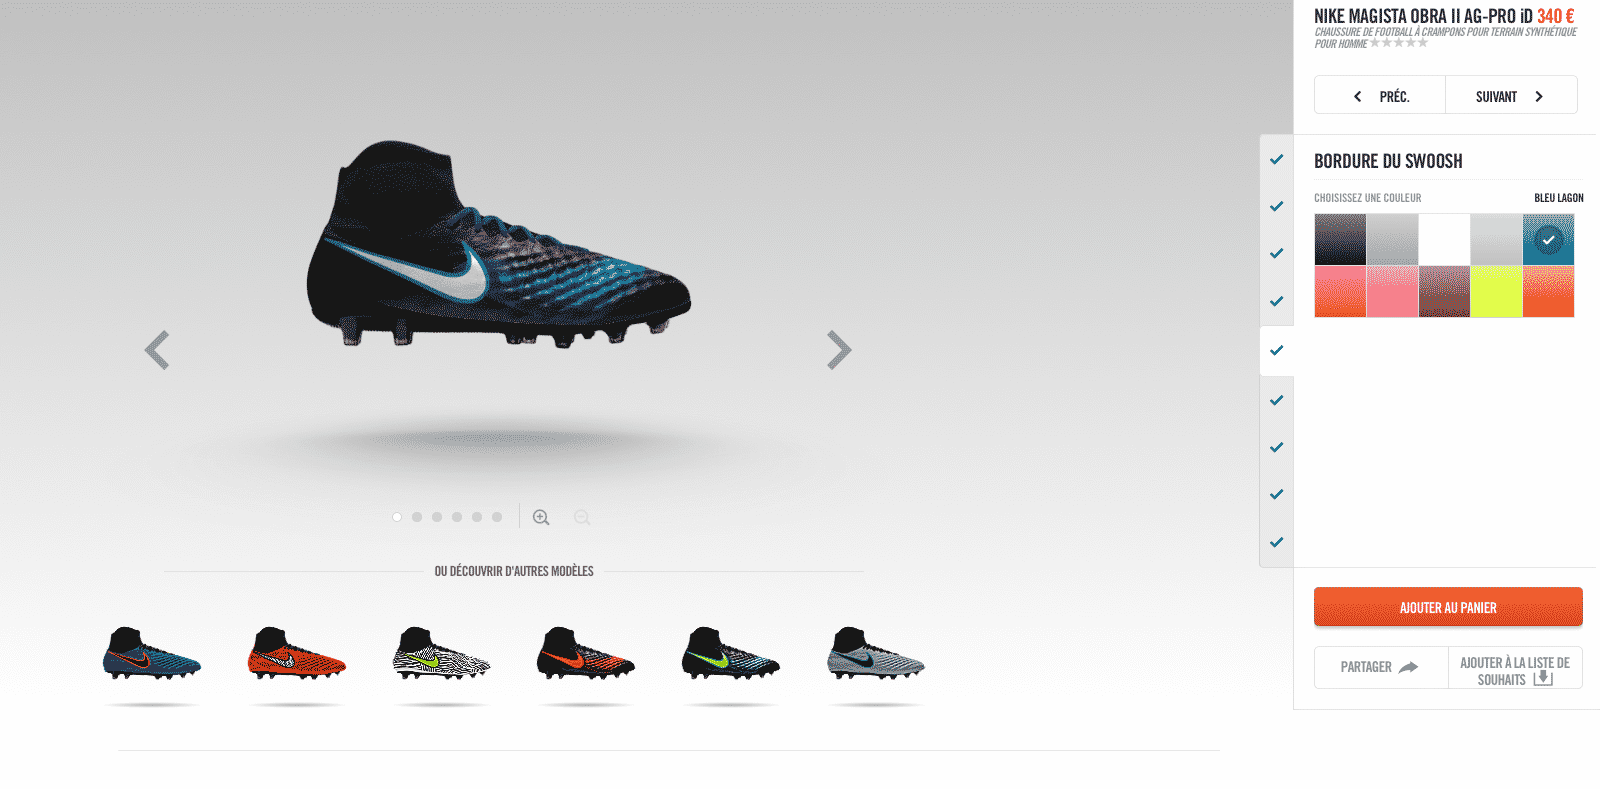 chaussures-football-Nike-Magista-2-personnalisation-9